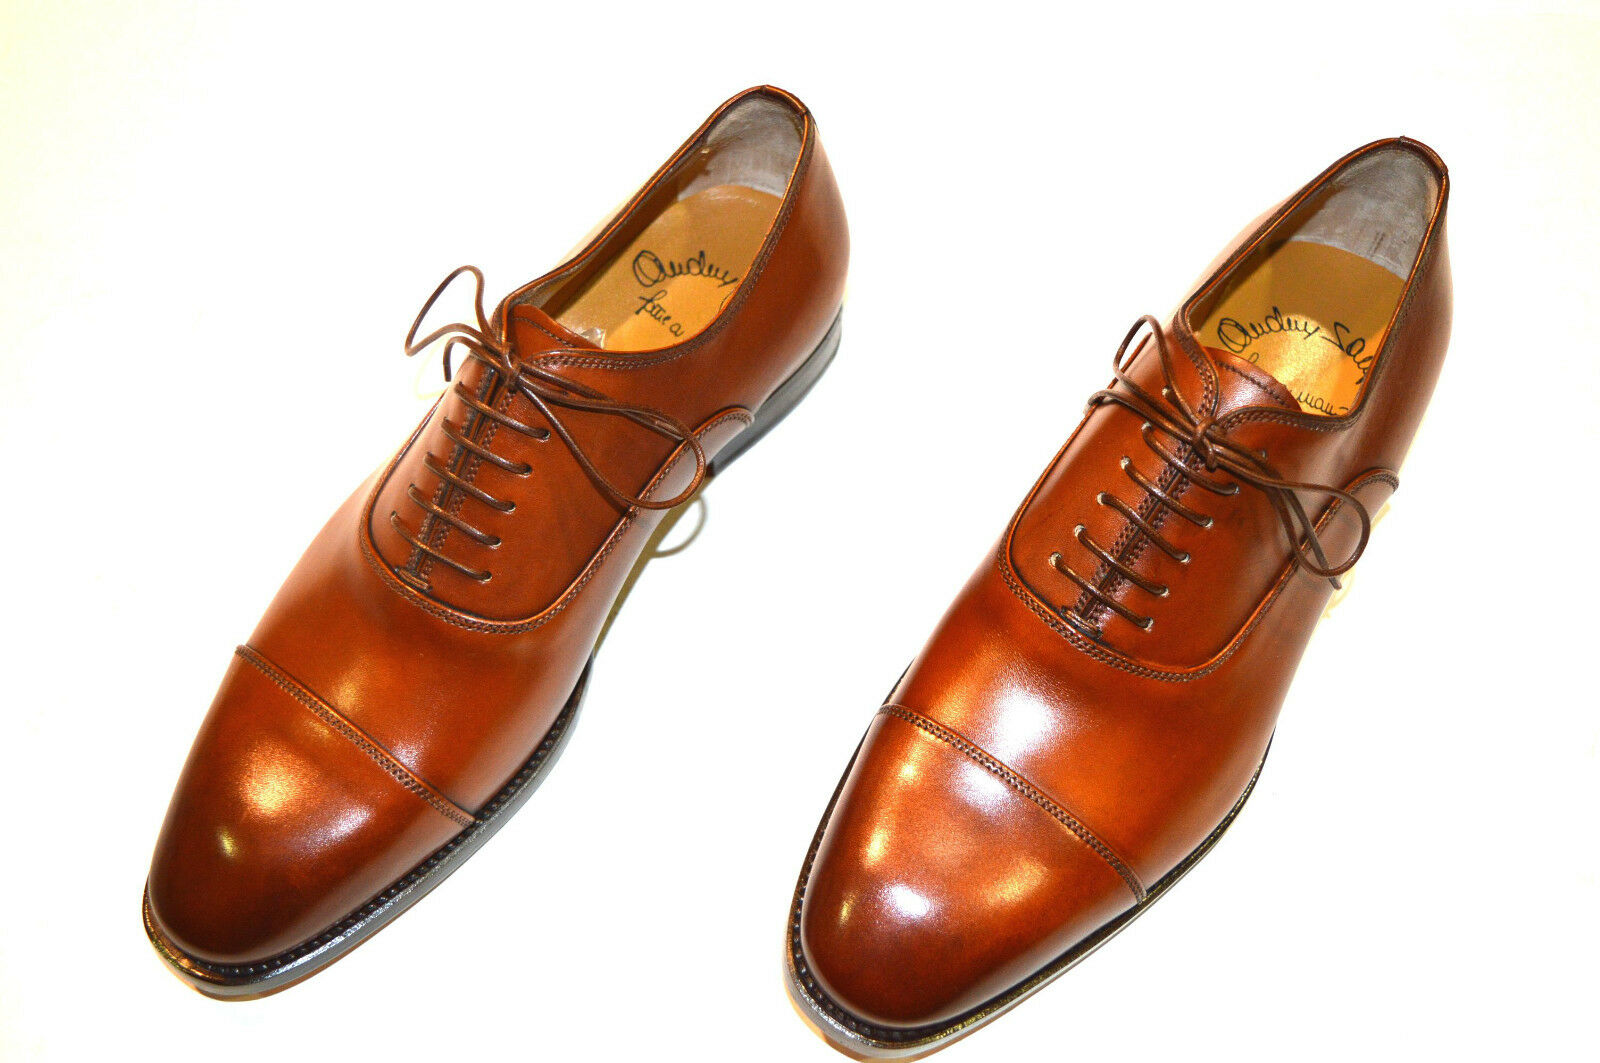 NEW SANTONI Dress Brown Leather shoes  SIZE Eu 45.5 Uk 11.5 Us 12.5 (6R)